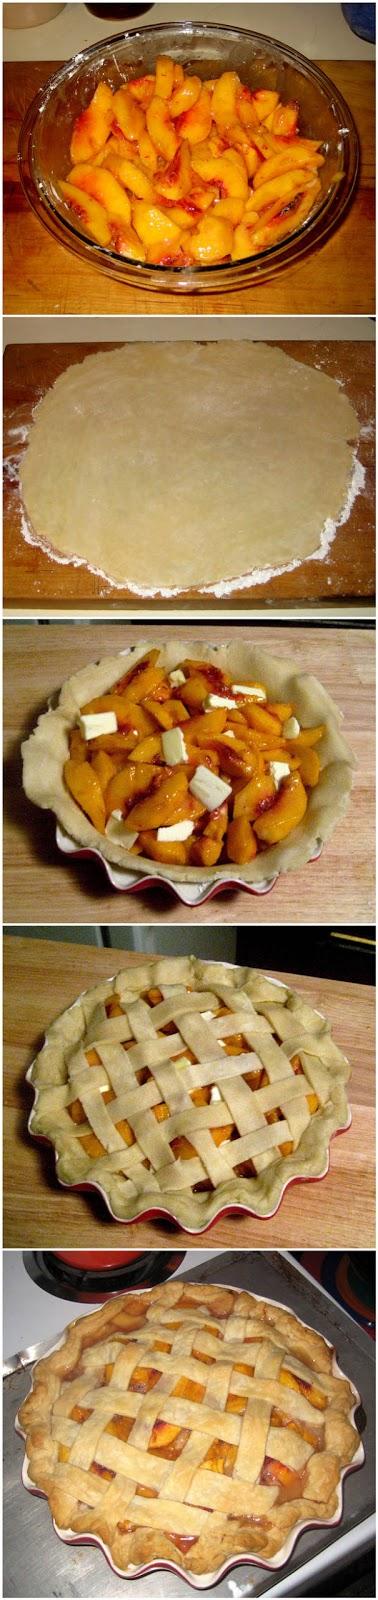 Delicious-Peach-Pie